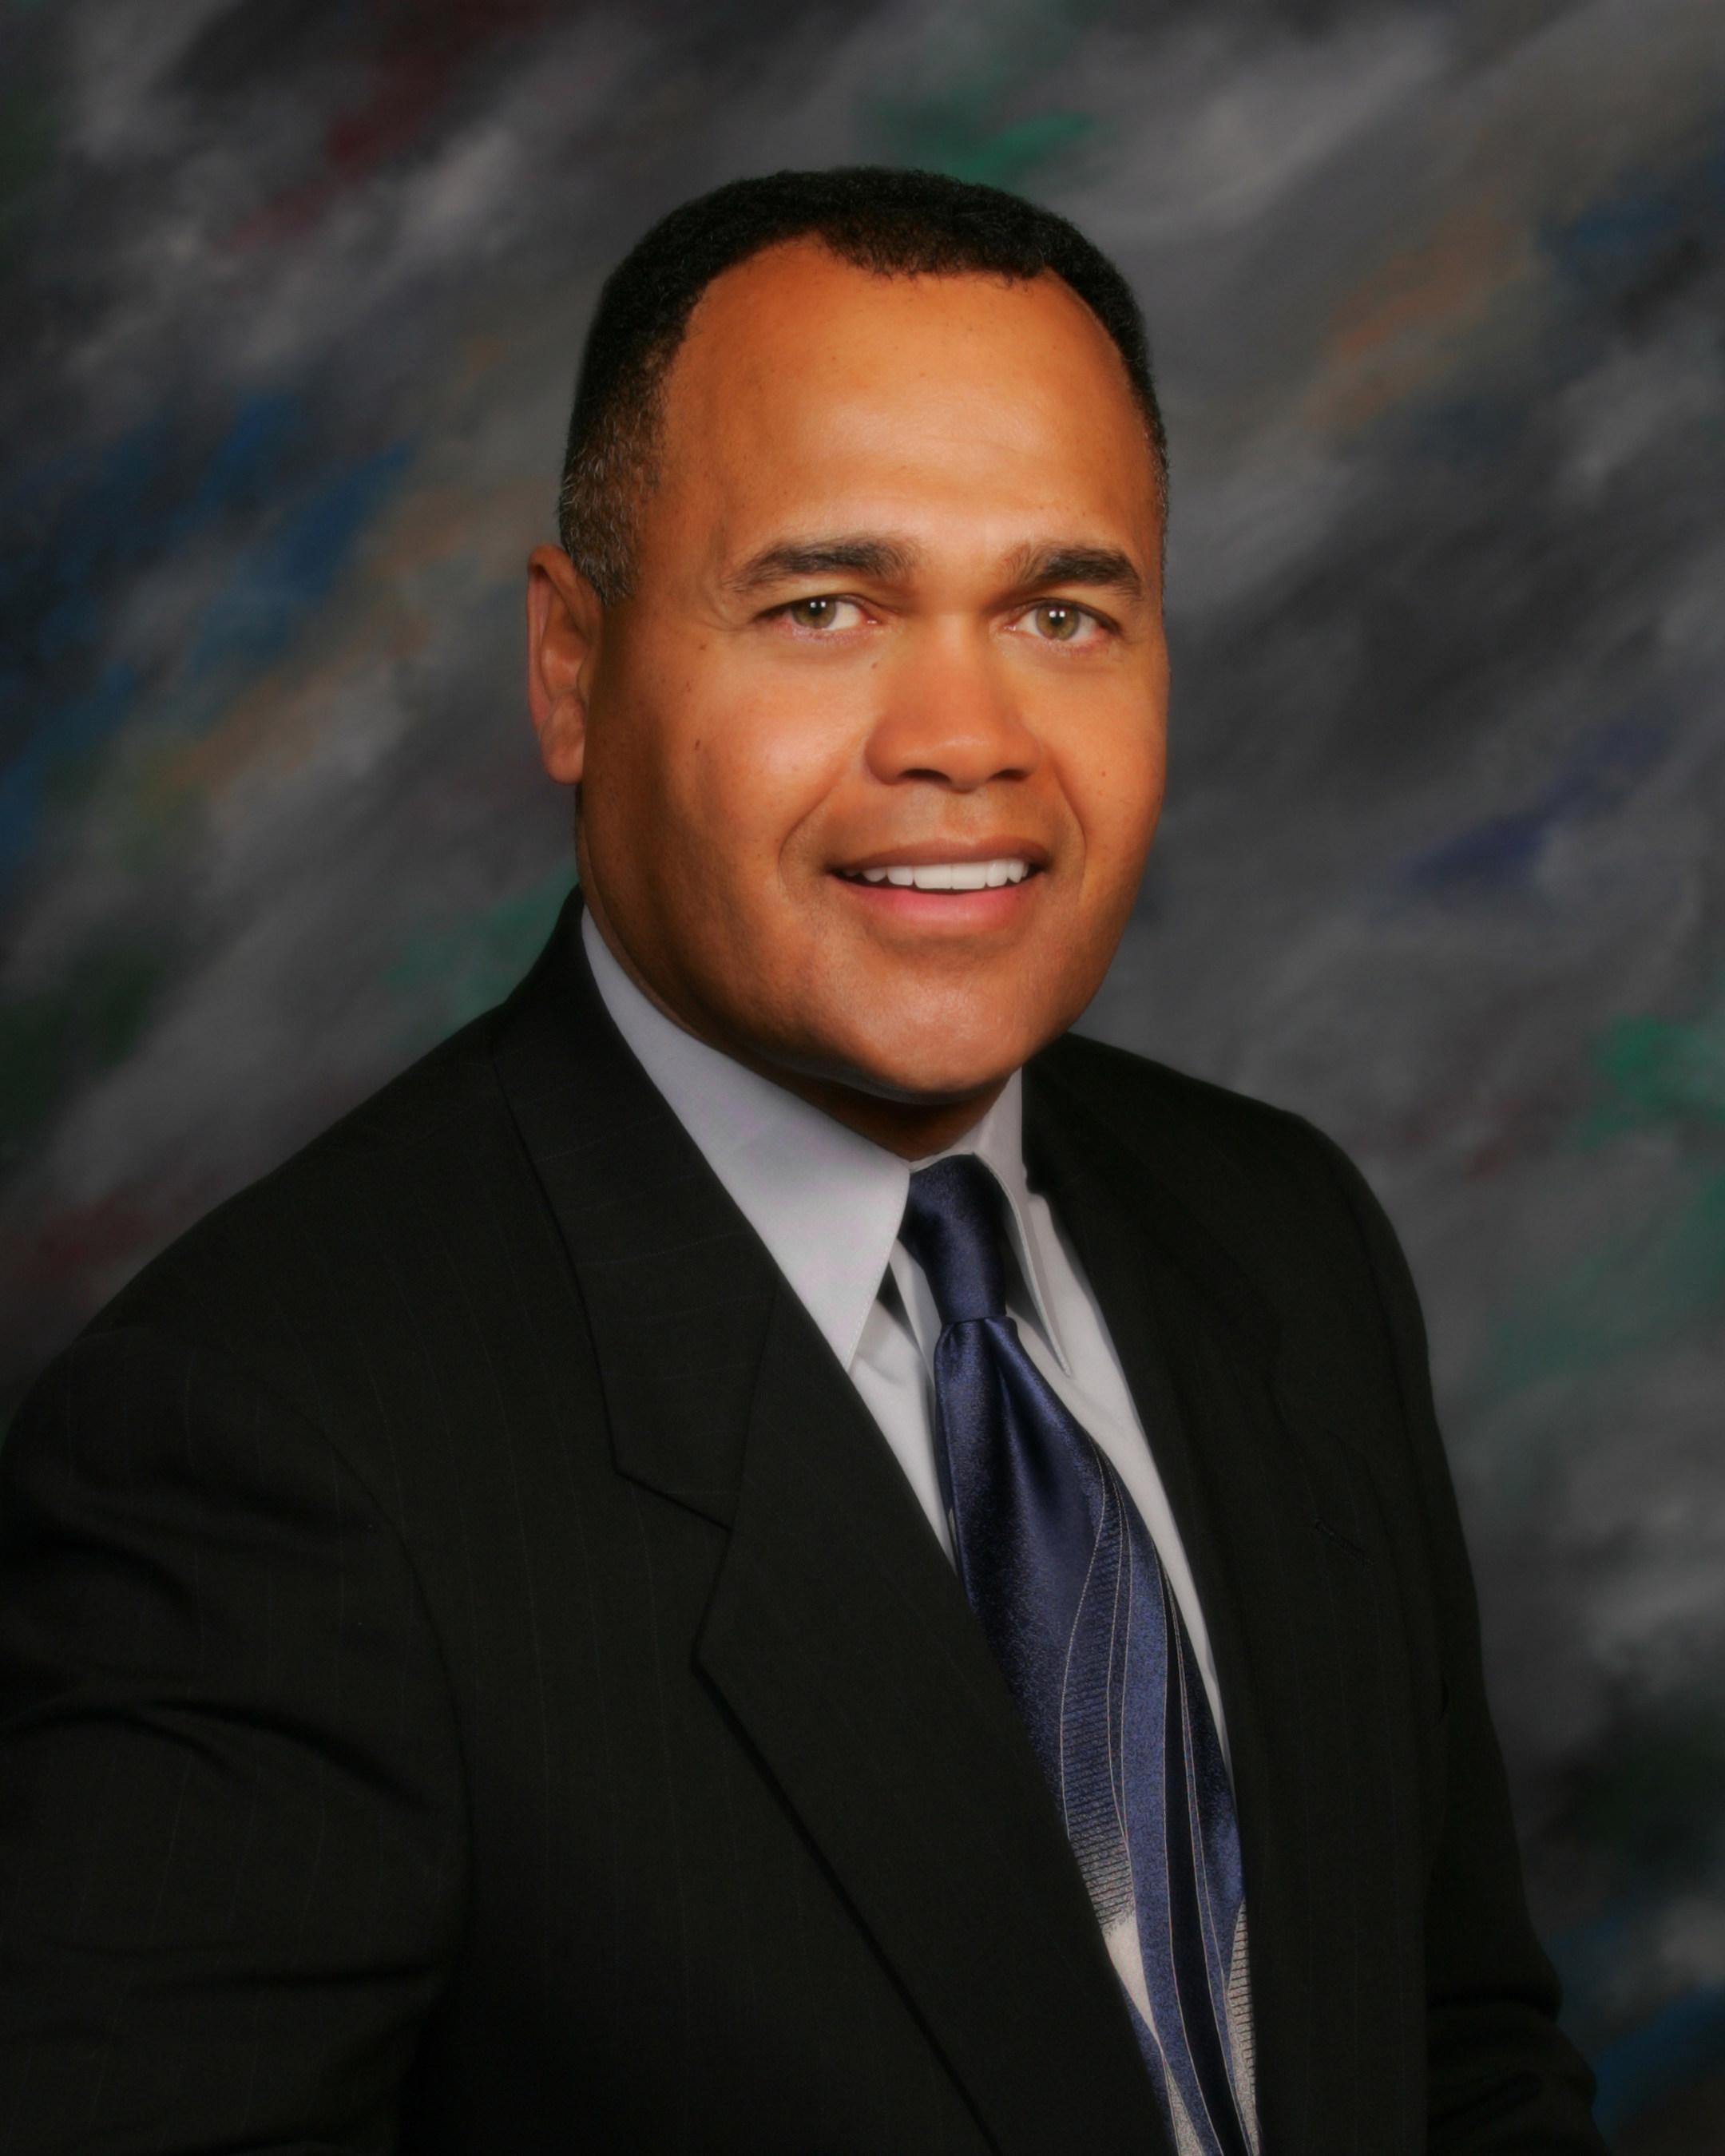 Hank Fore, Comcast California's Regional Senior Vice President